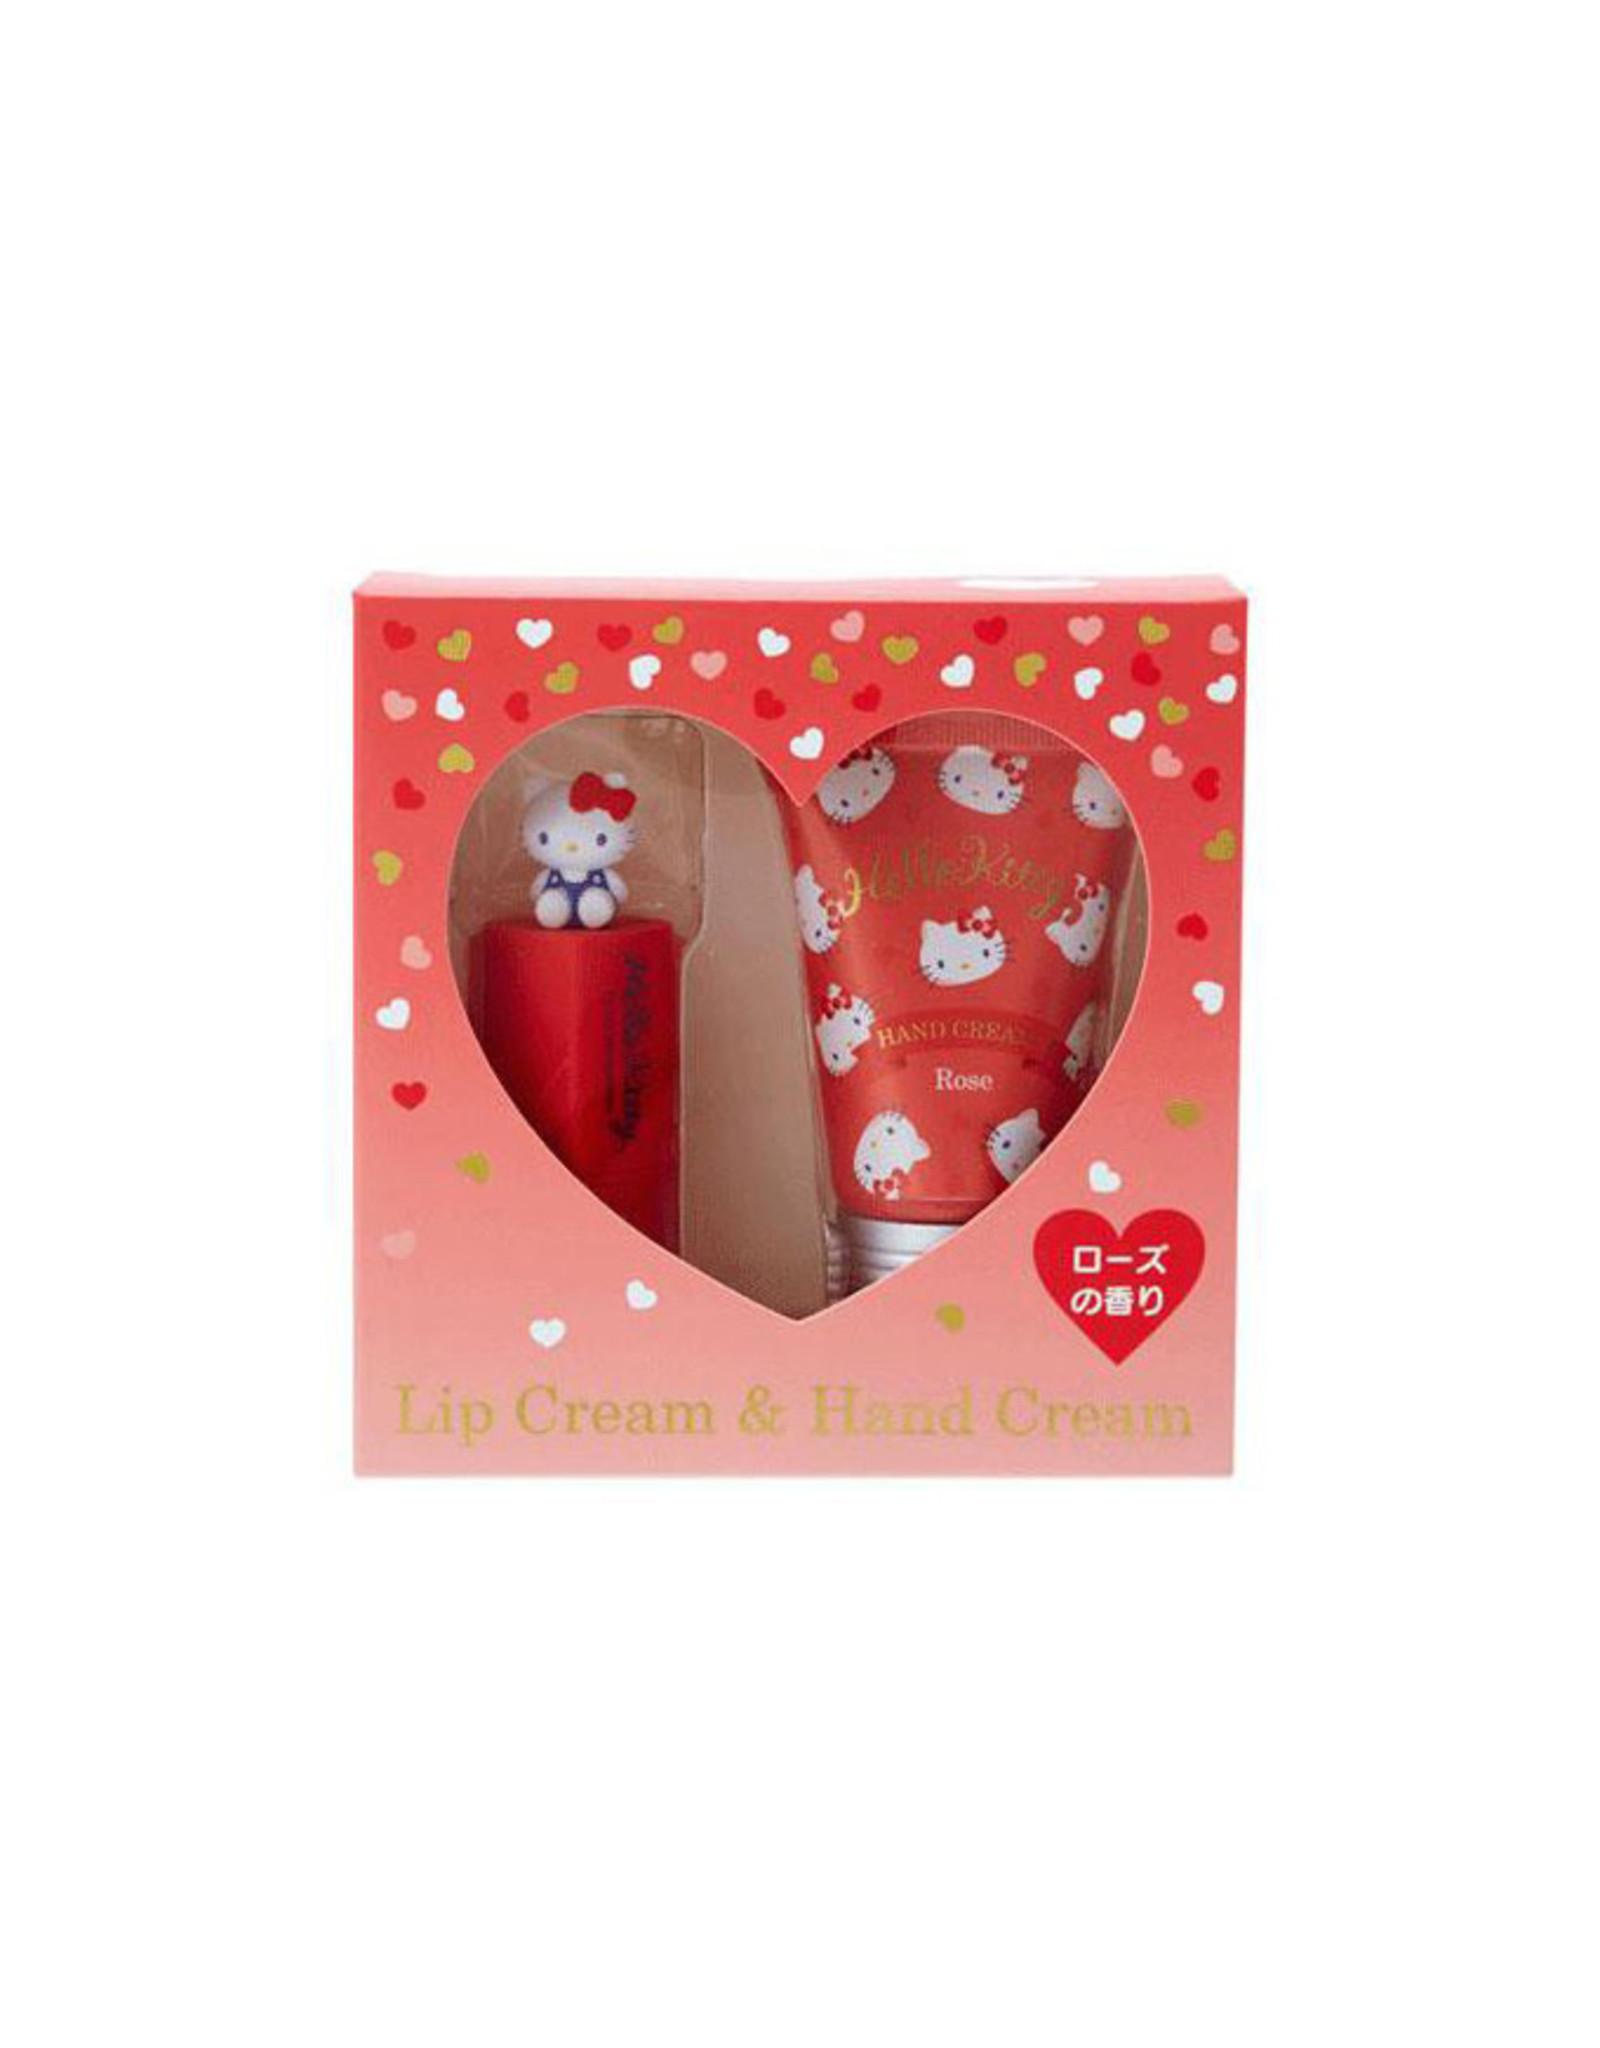 Sanrio Sanrio Hello Kitty Lip Balm & Hand Cream Set - Rose flavor